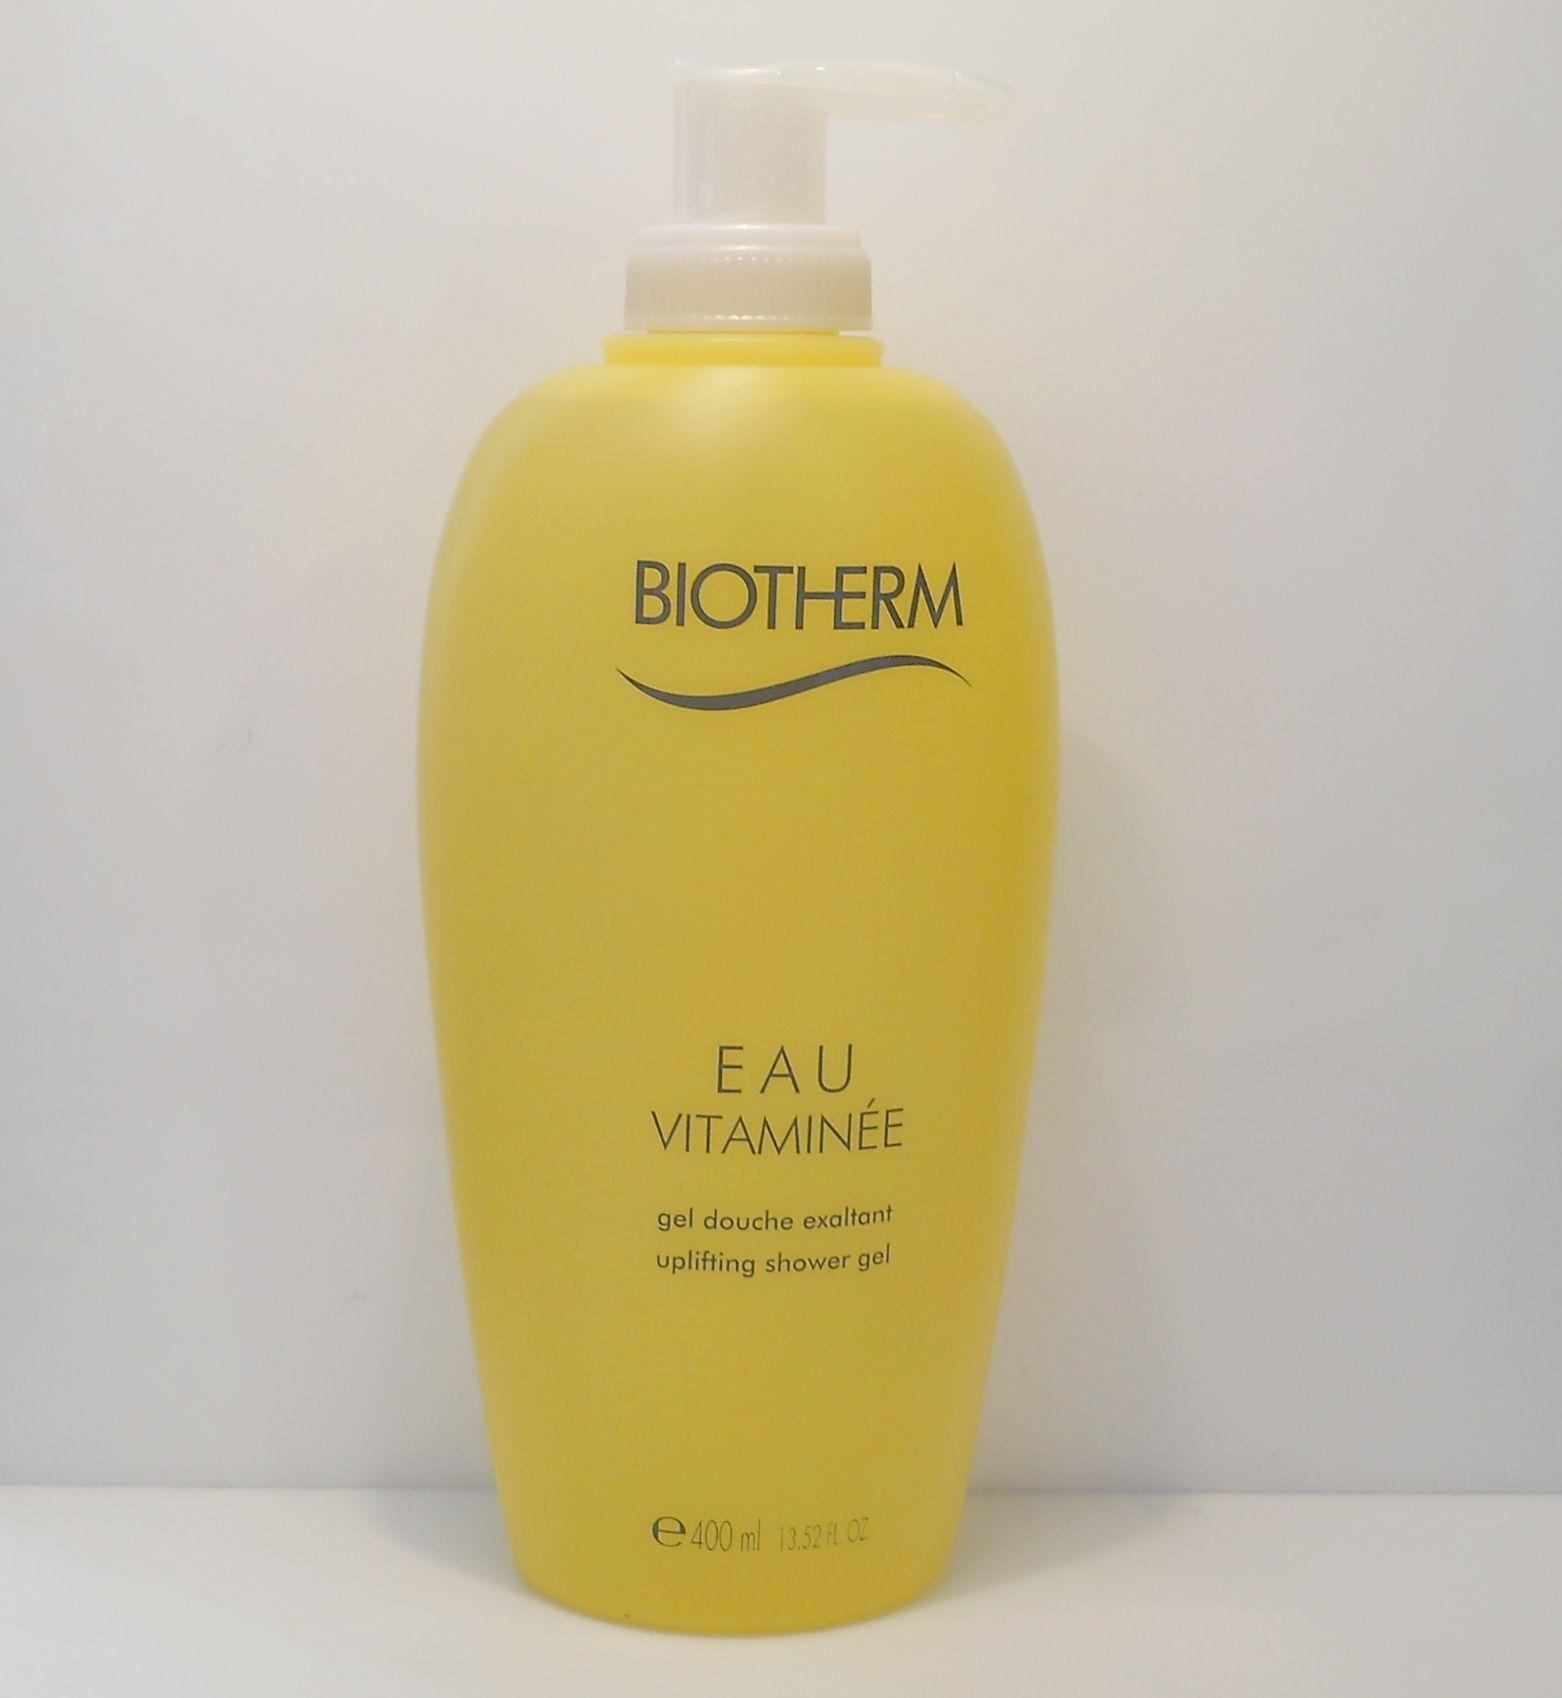 biotherm eau vitaminee 400 ml